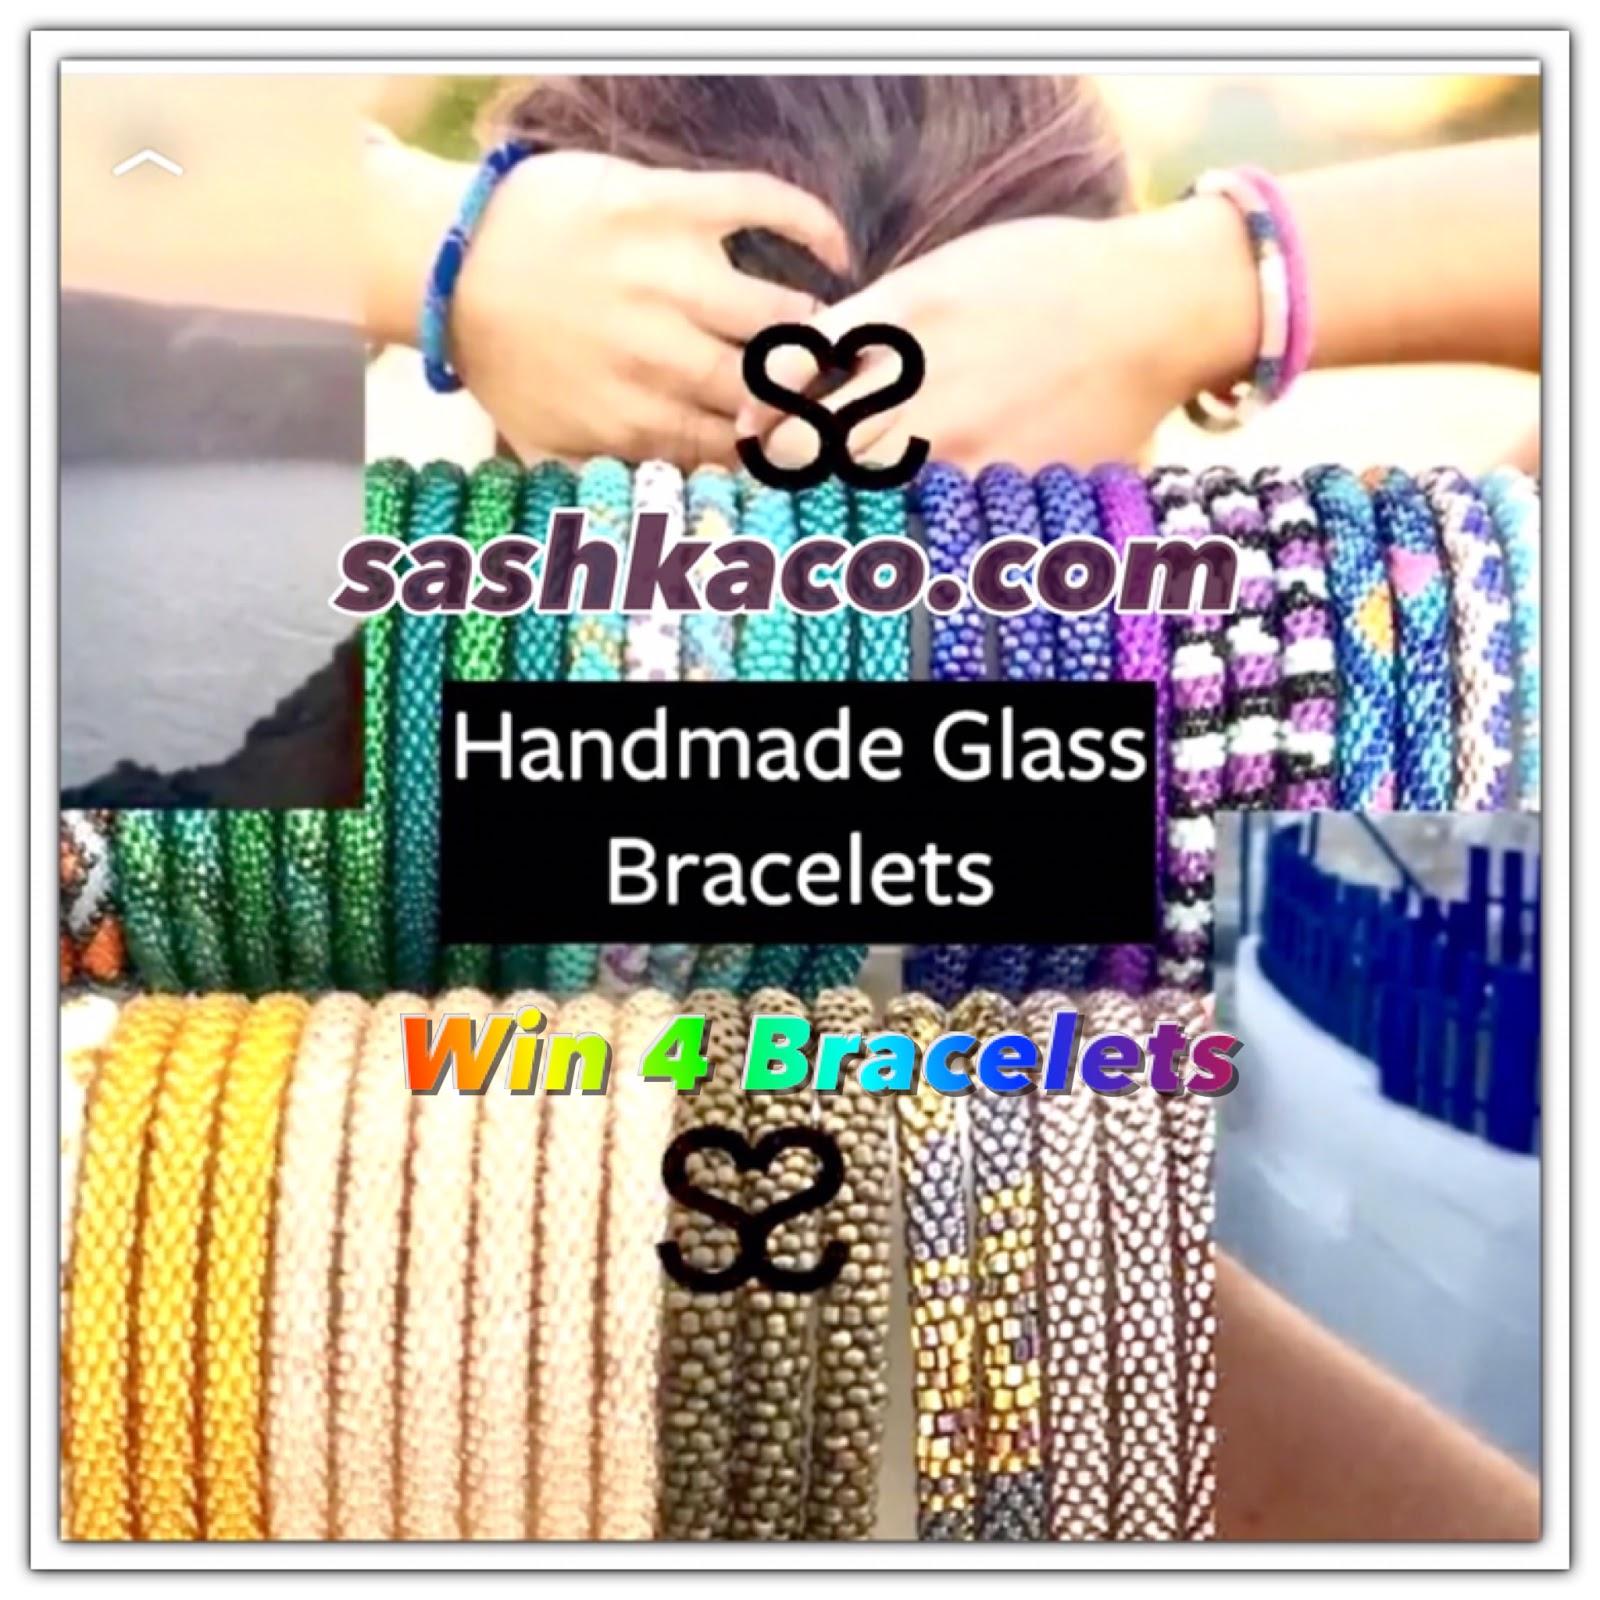 100% Quality Silver Bracelet Chain Ladies Gift Girl Womens Bling Bracelet Jewellery Gw Crease-Resistance Bracelets Jewelry & Watches